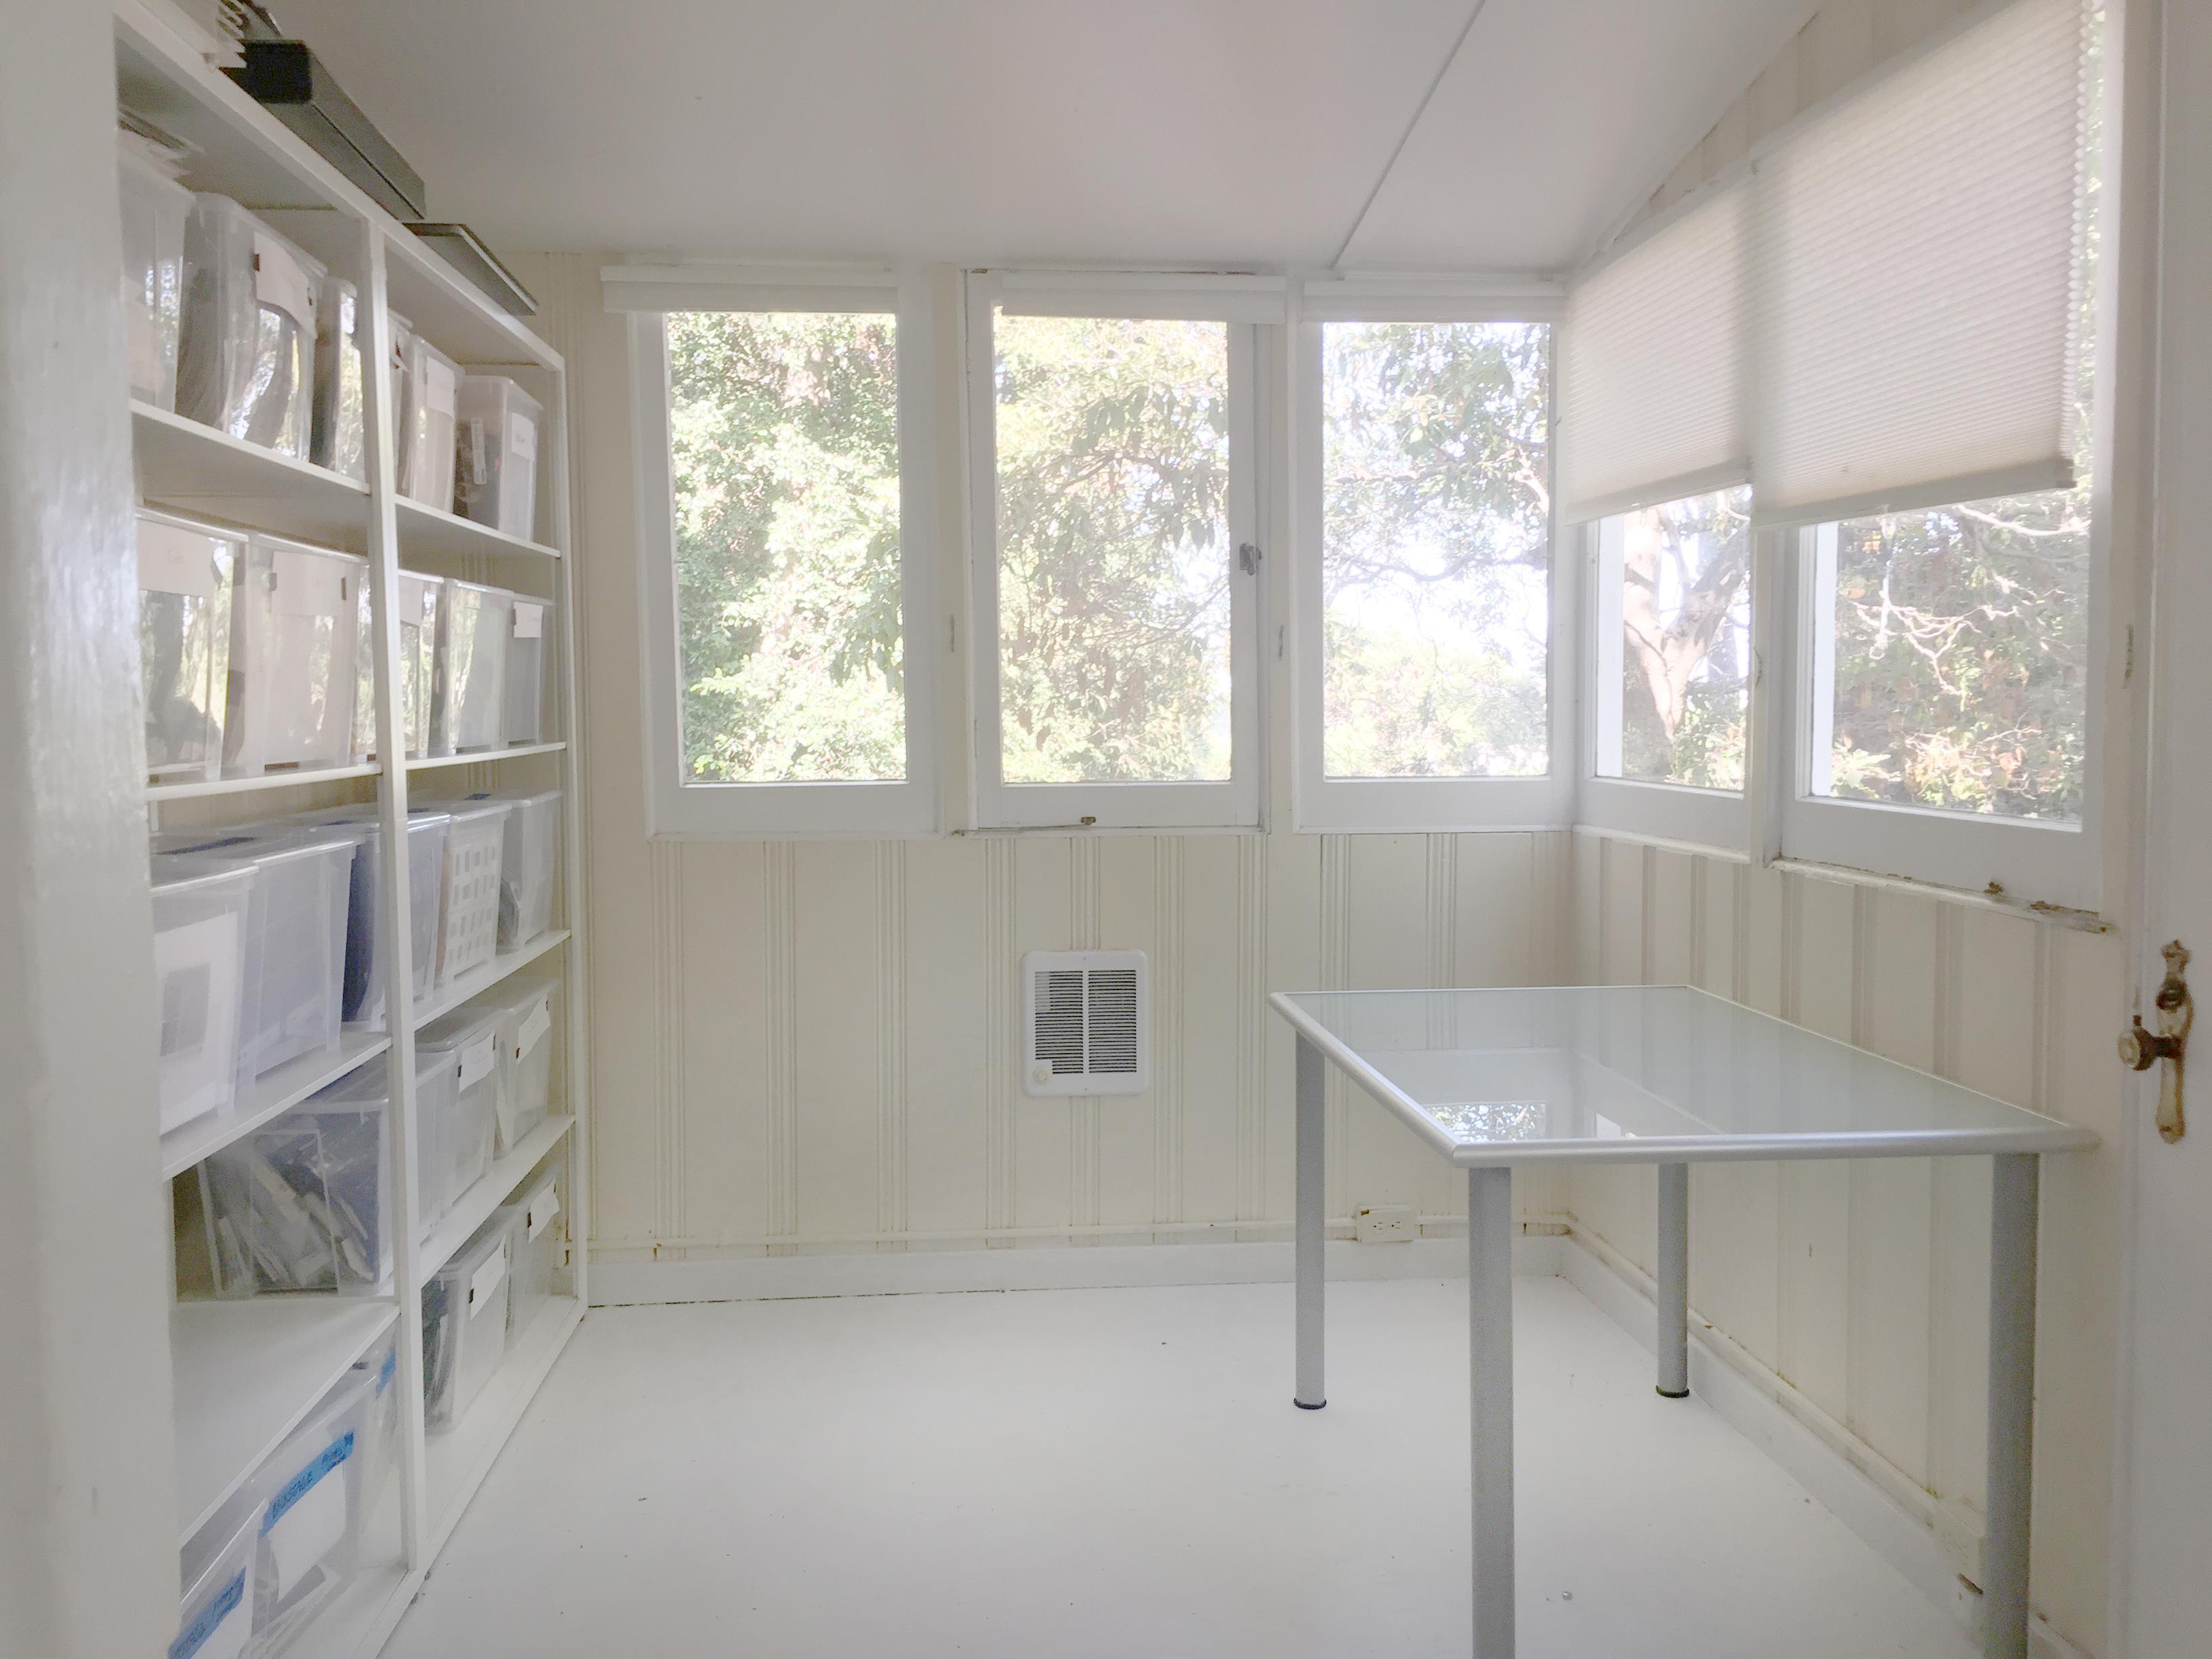 JL Studio - Private Co Working Office in Mar Vista